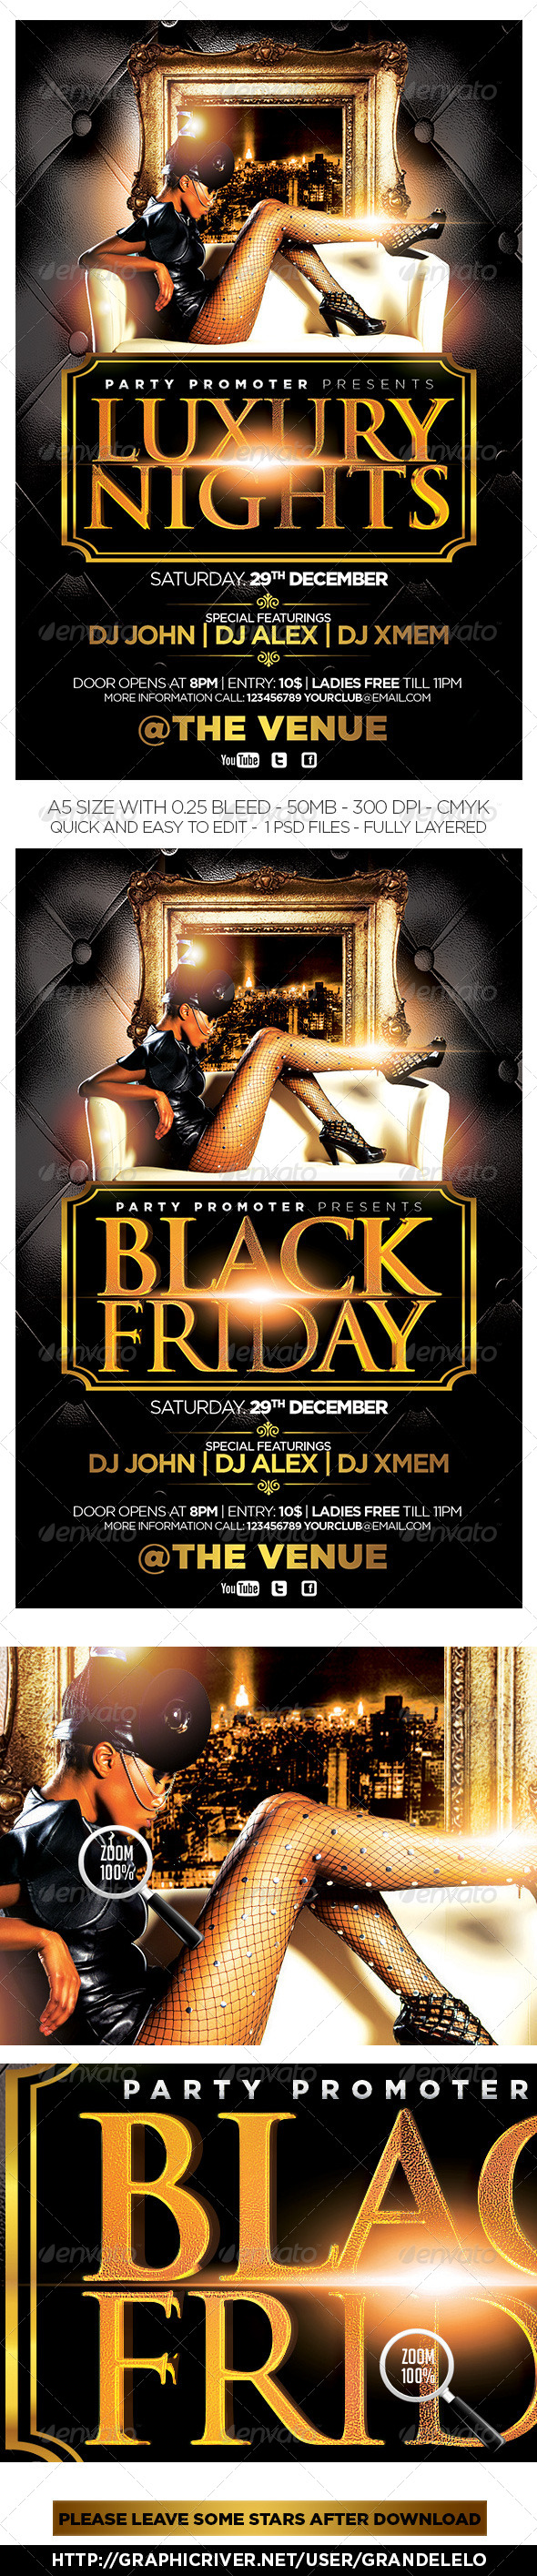 Luxury Nights / Black Friday Flyer